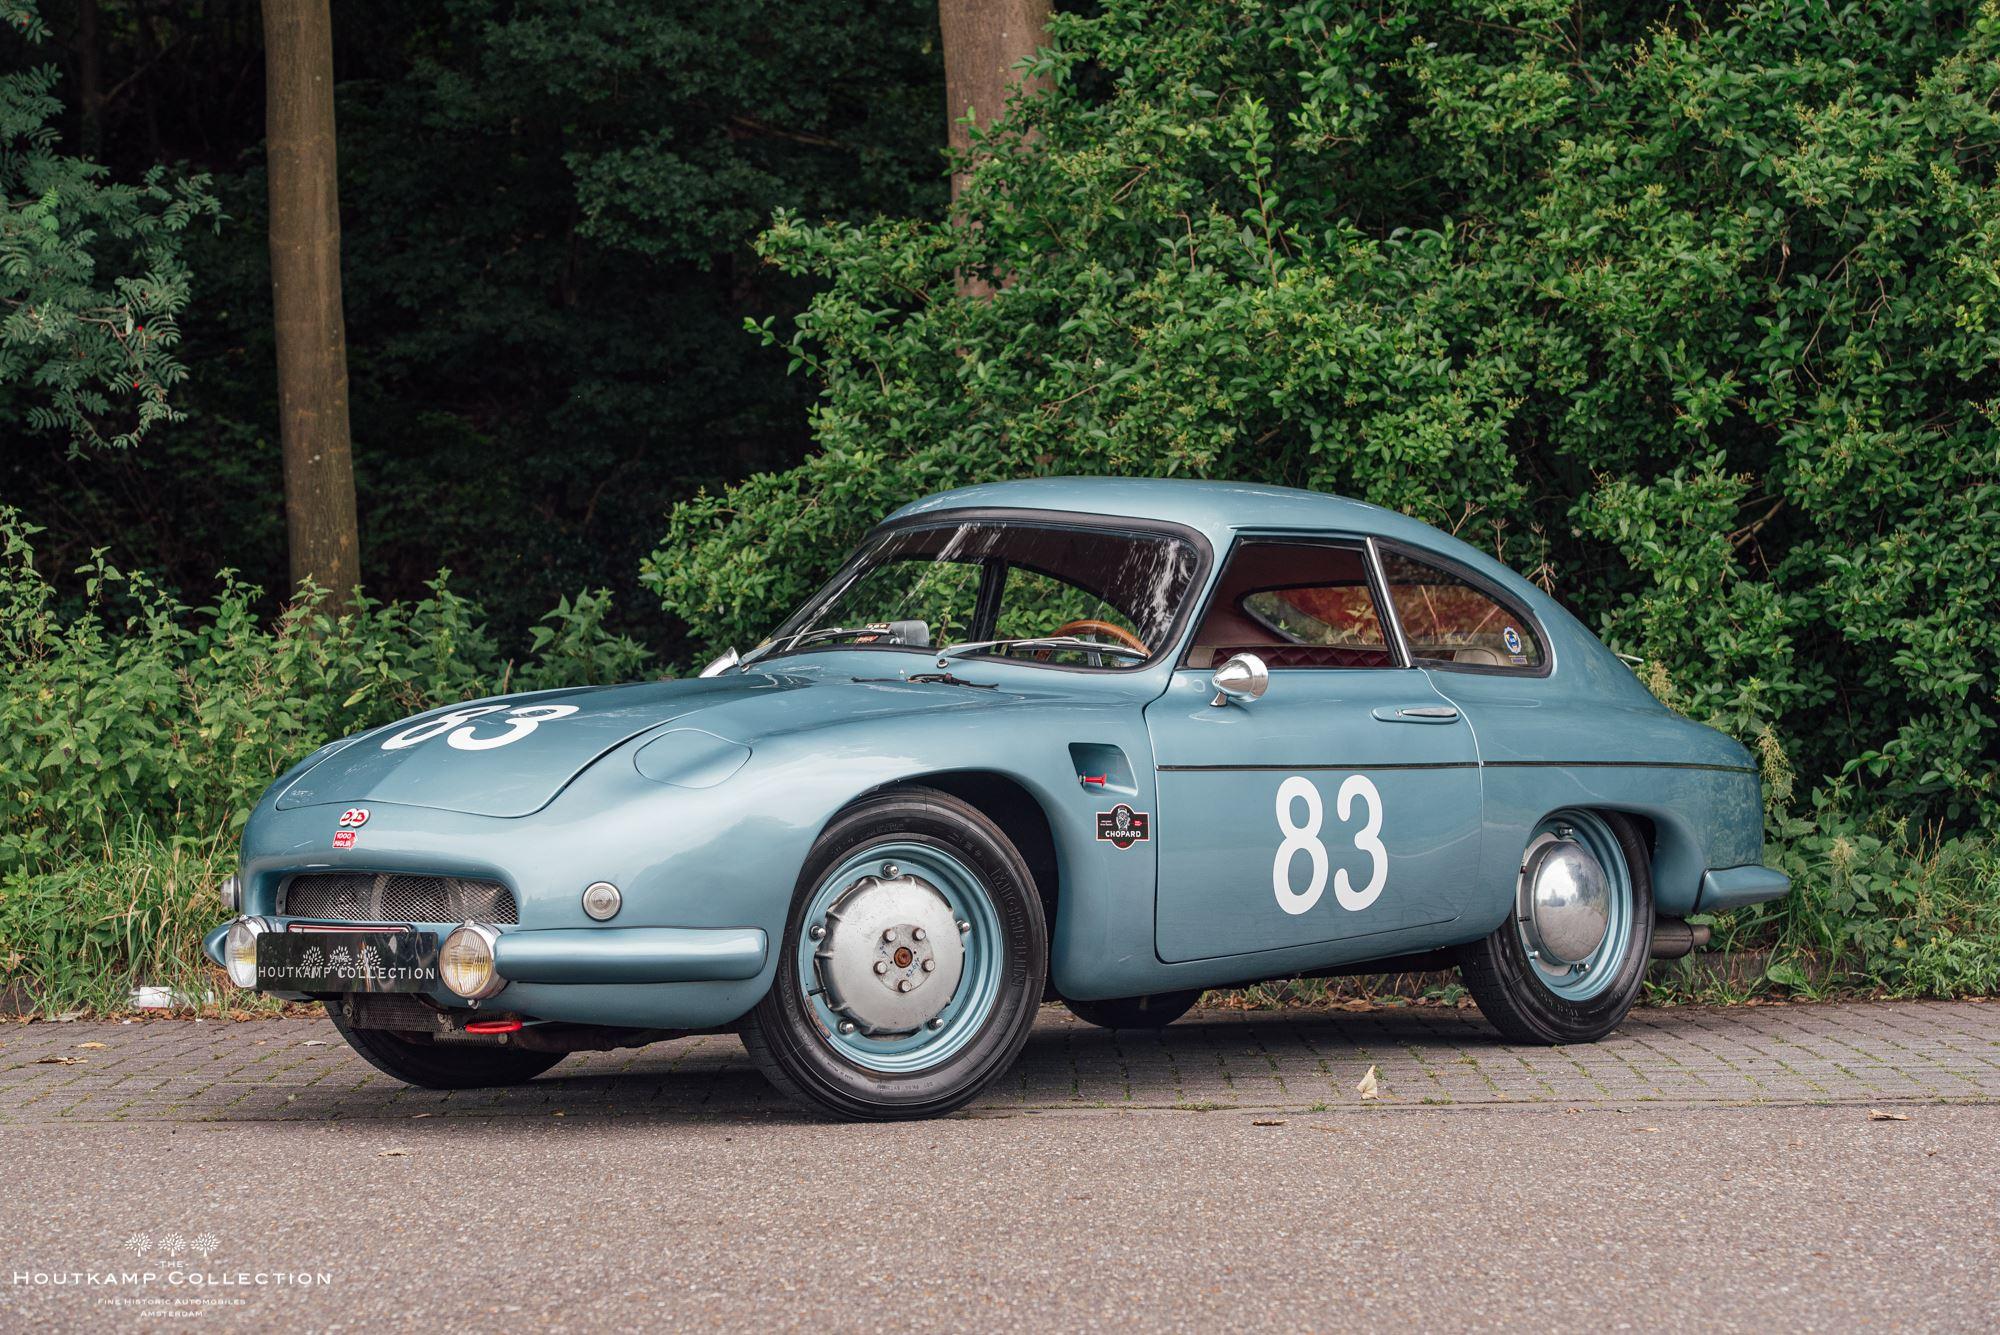 1956-DB-HBR-5-Race-car-Mille-Miglia-1957-(1)